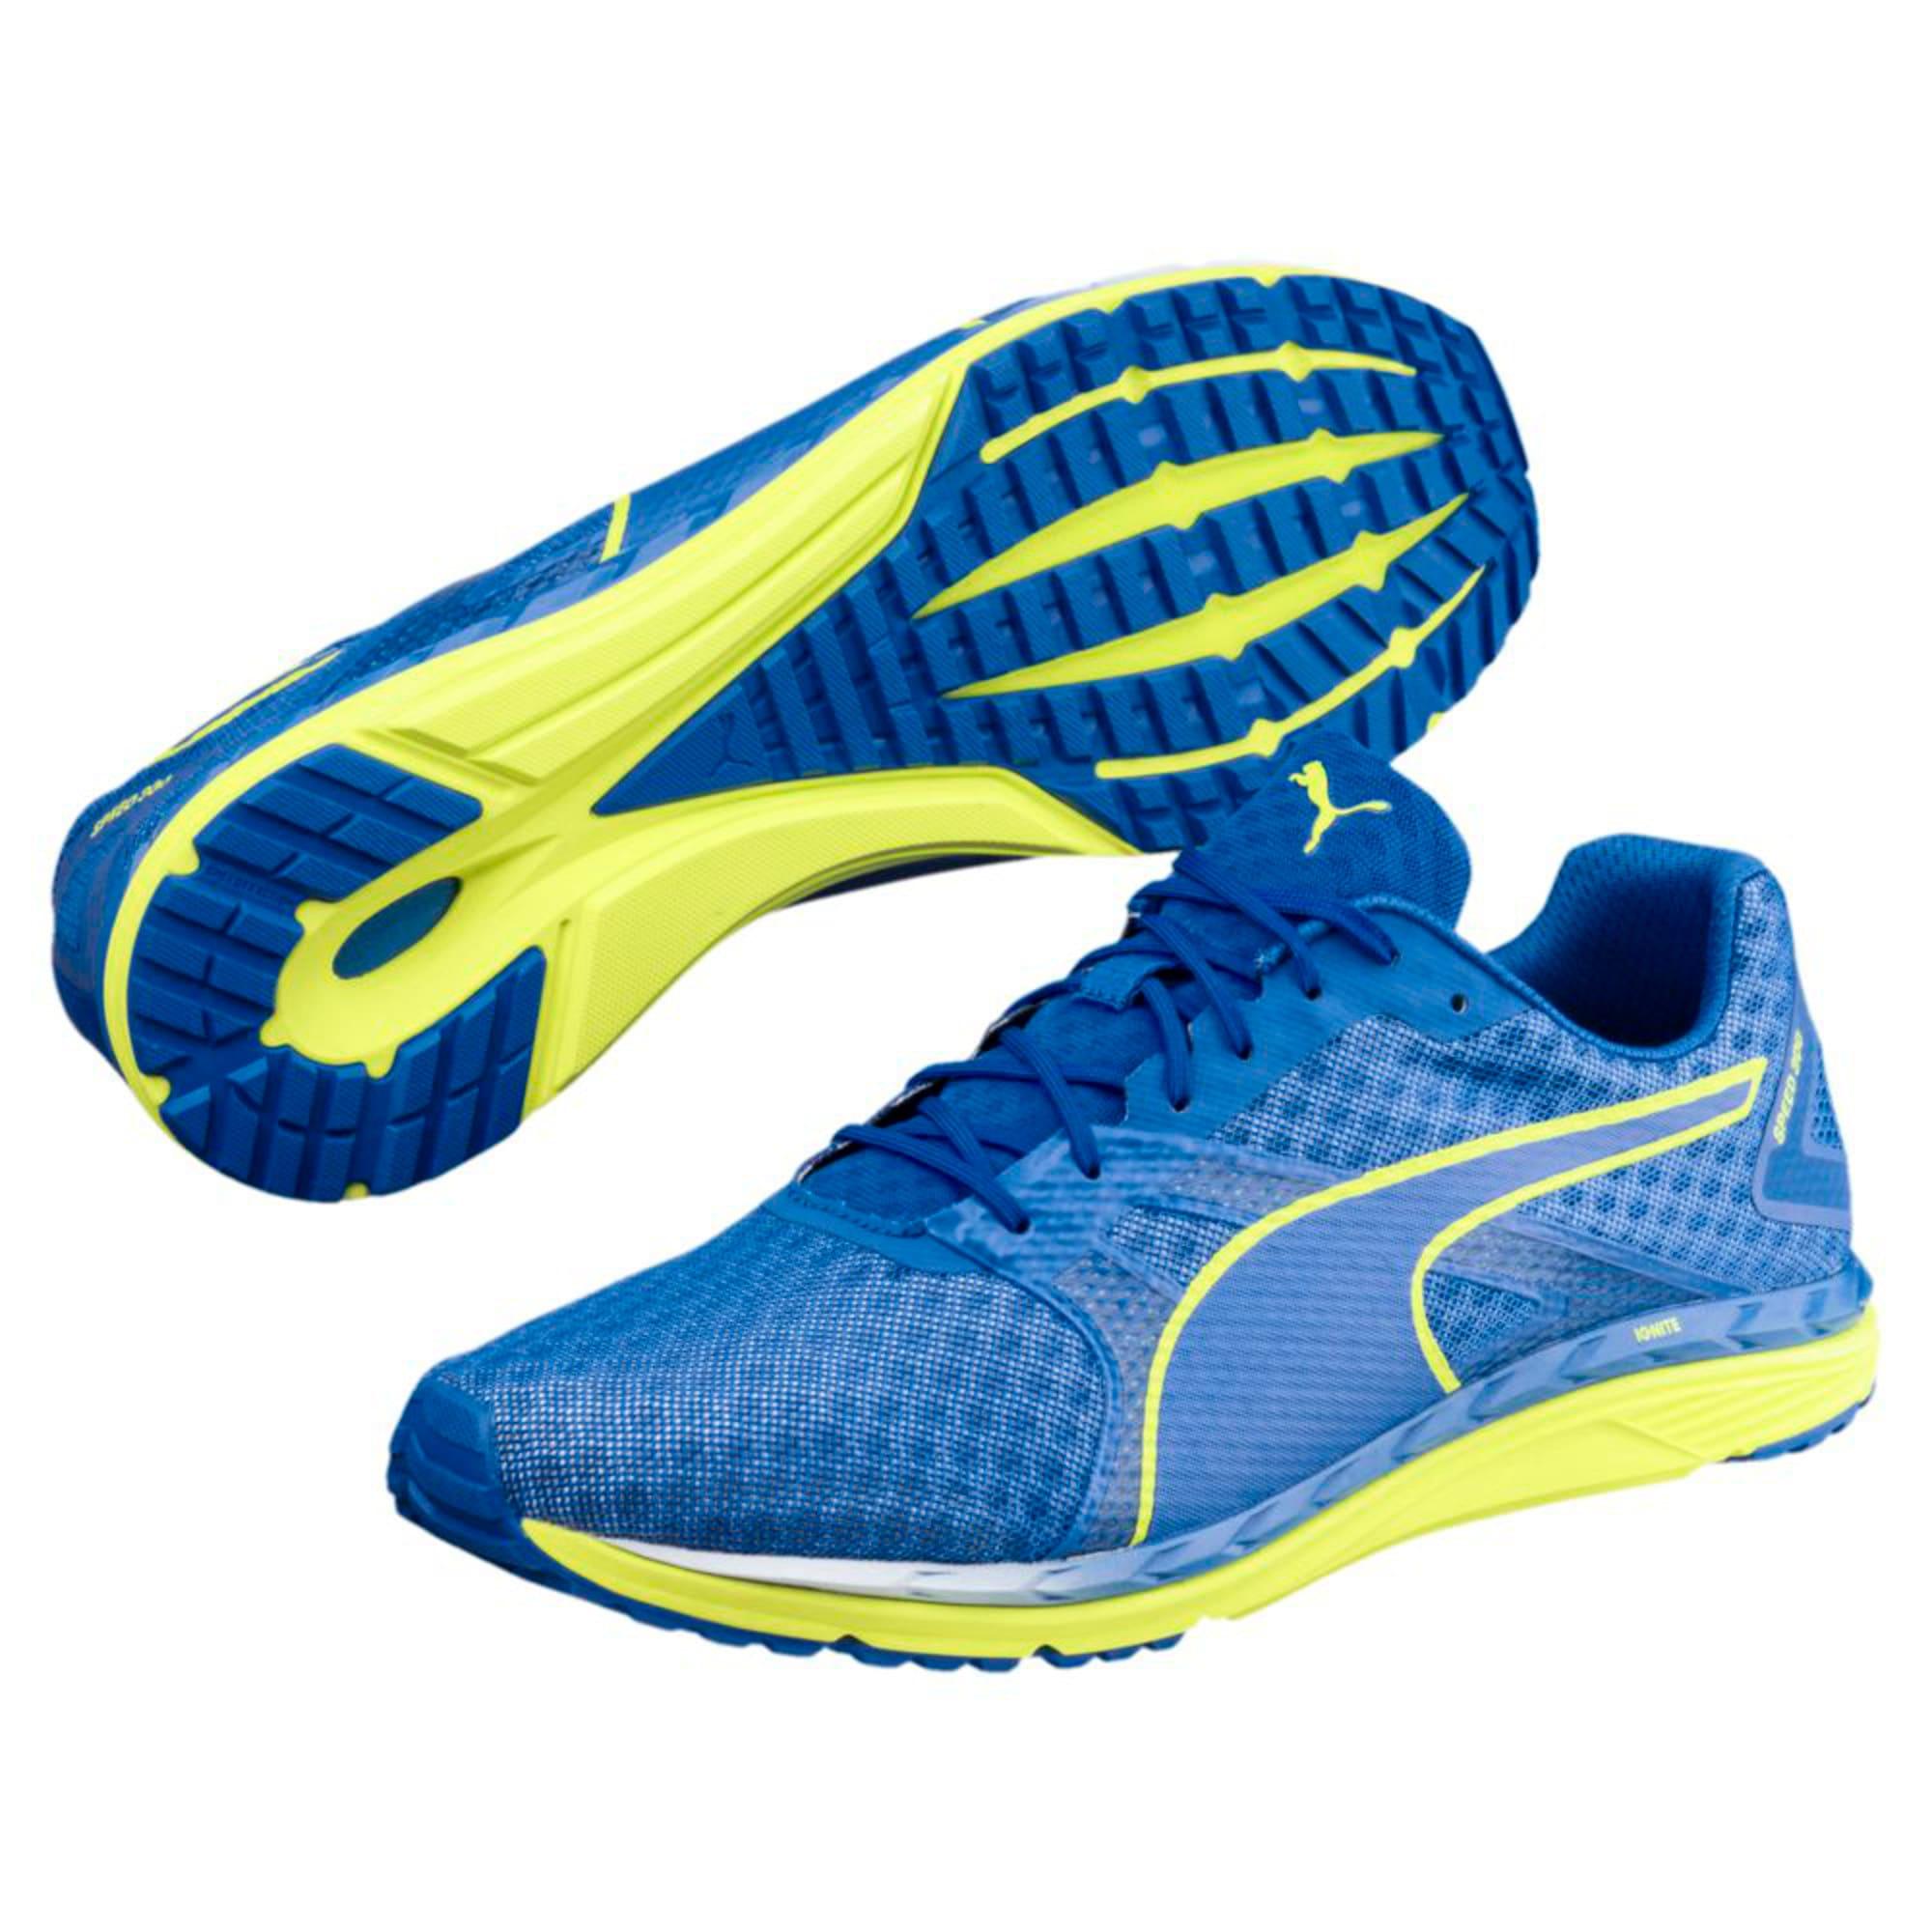 Thumbnail 6 of Speed 300 IGNITE 3 Men's Running Shoes, Turkish Sea-Peacoat-Yellow, medium-IND